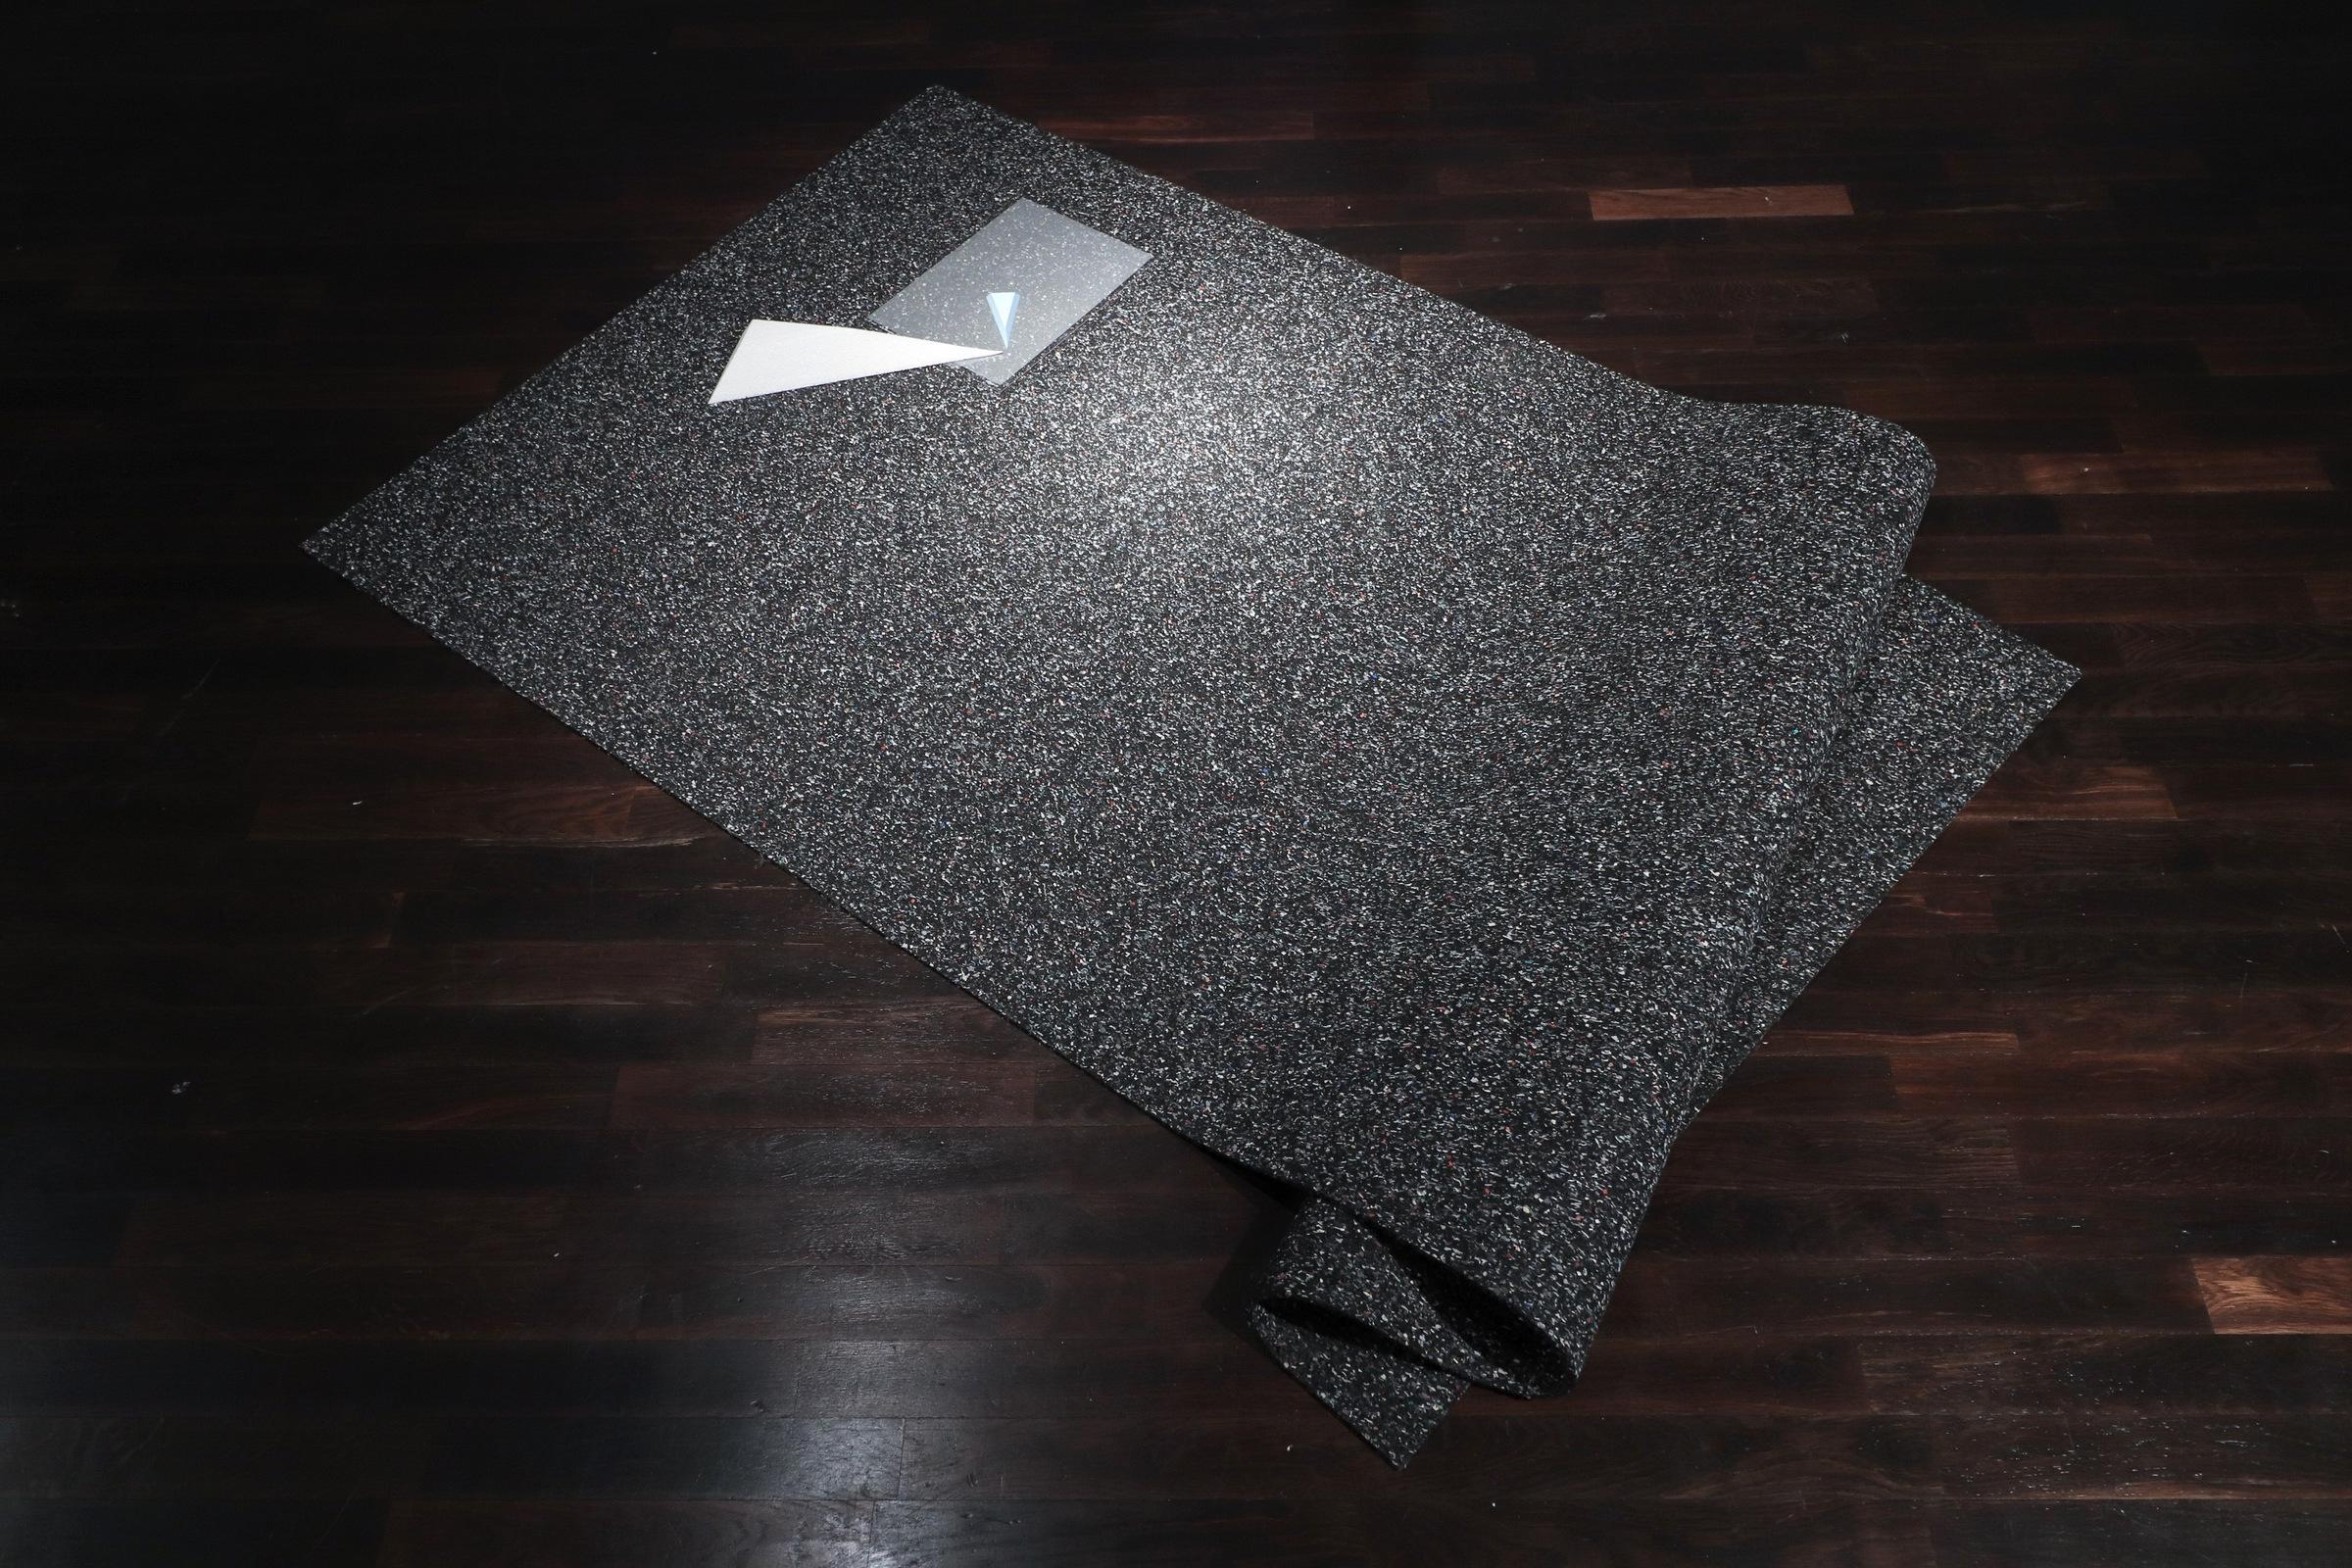 Selective Sensitivity, 2017, 160 x 120 x 15 cm, rubber sheet, styrofoam, plastic sheet